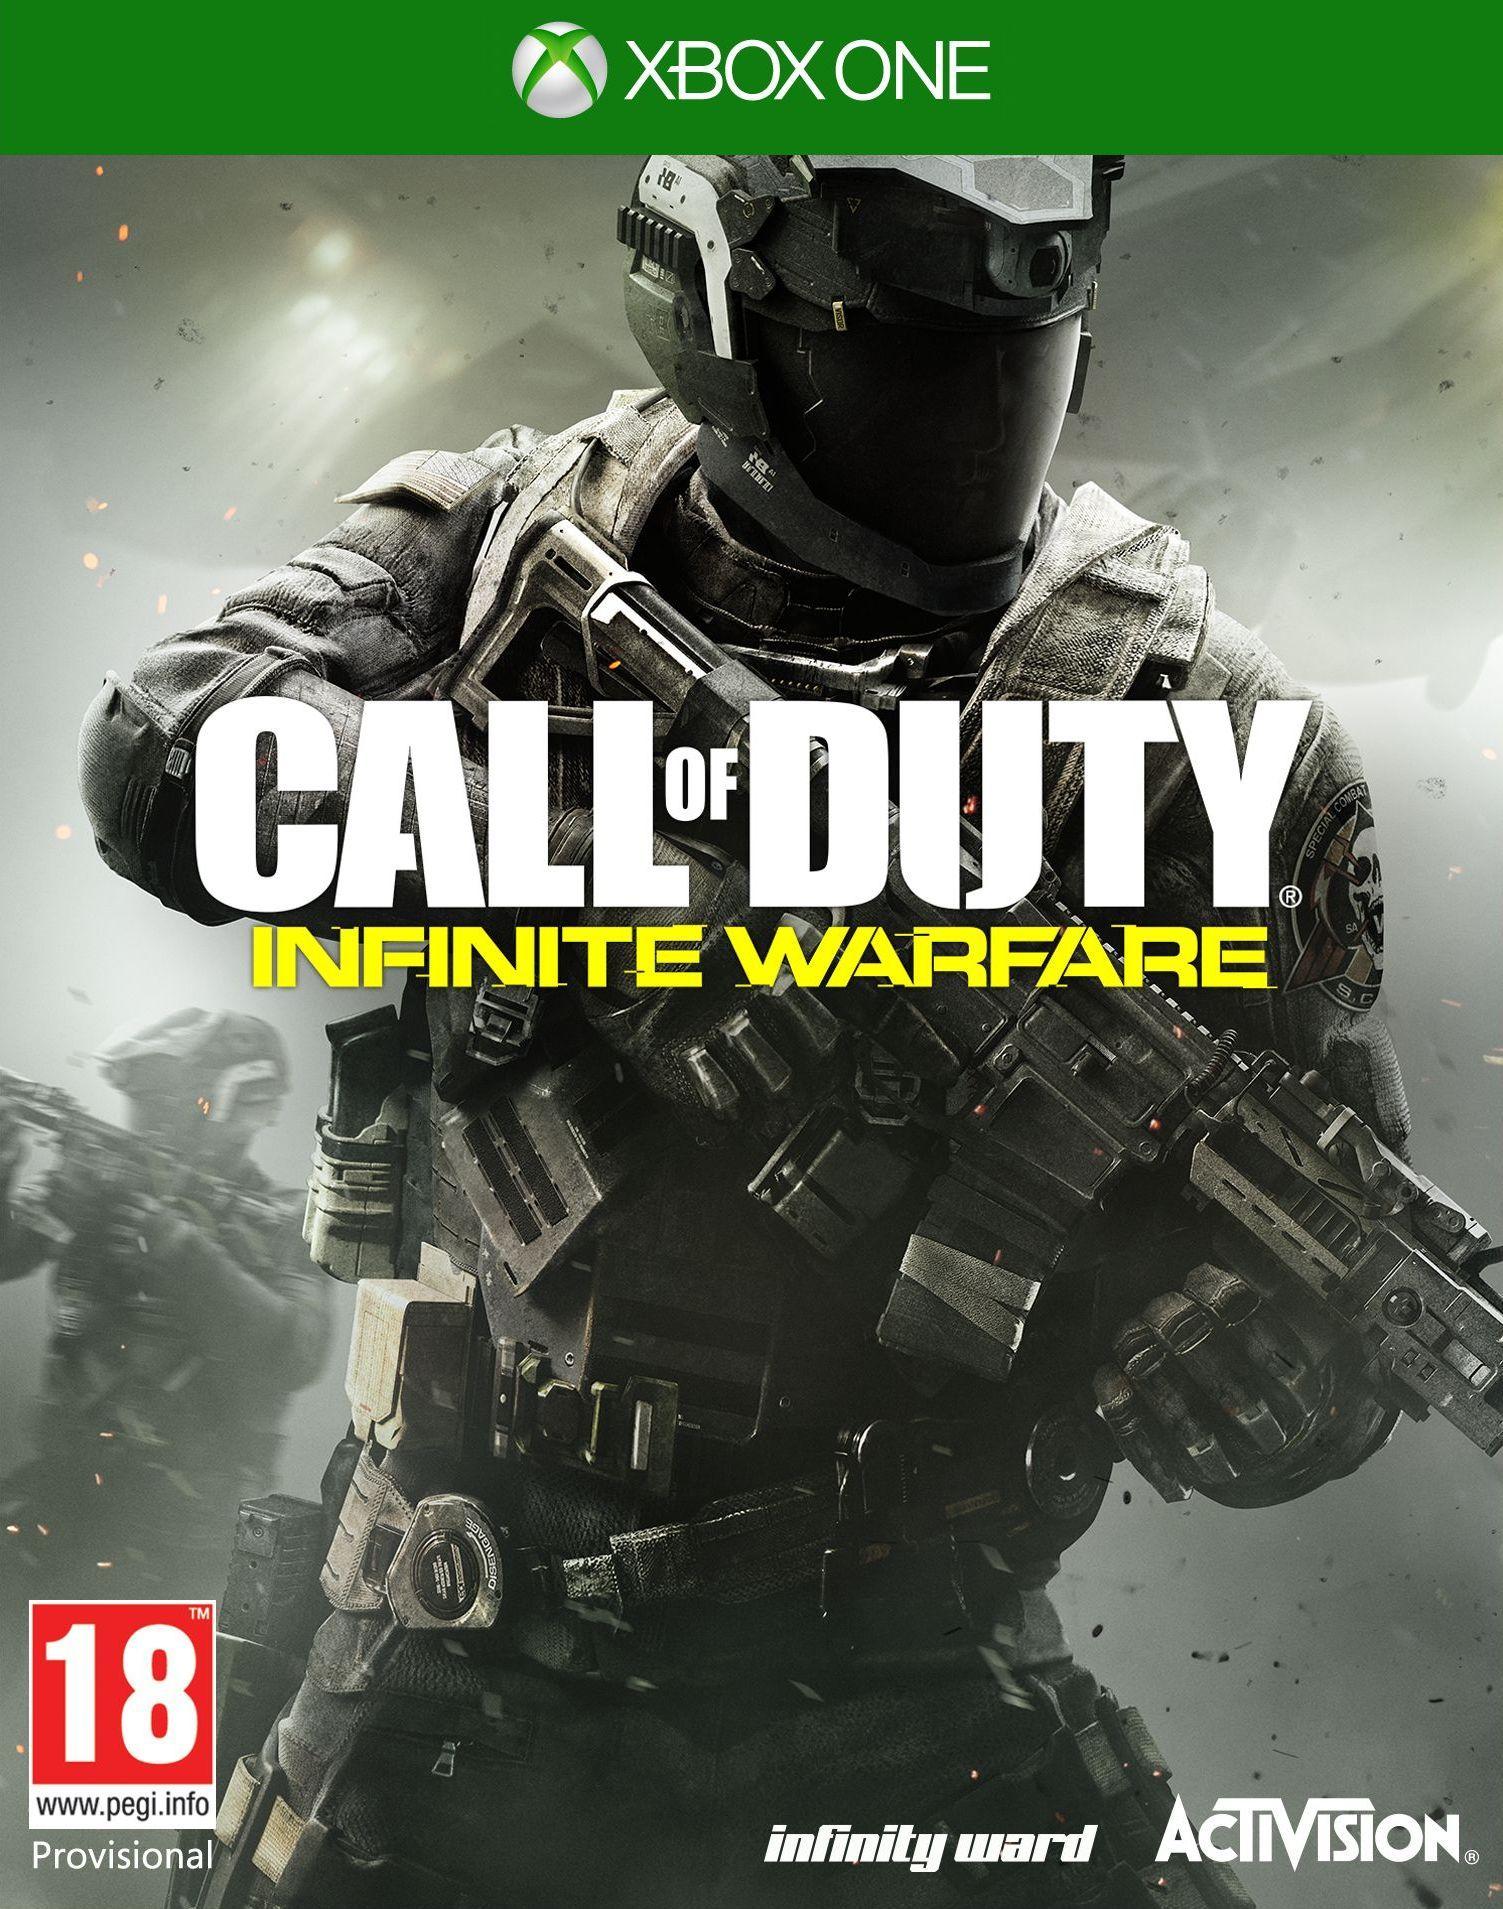 Call of Duty: Infinite Warfare (Xbox One) - 1